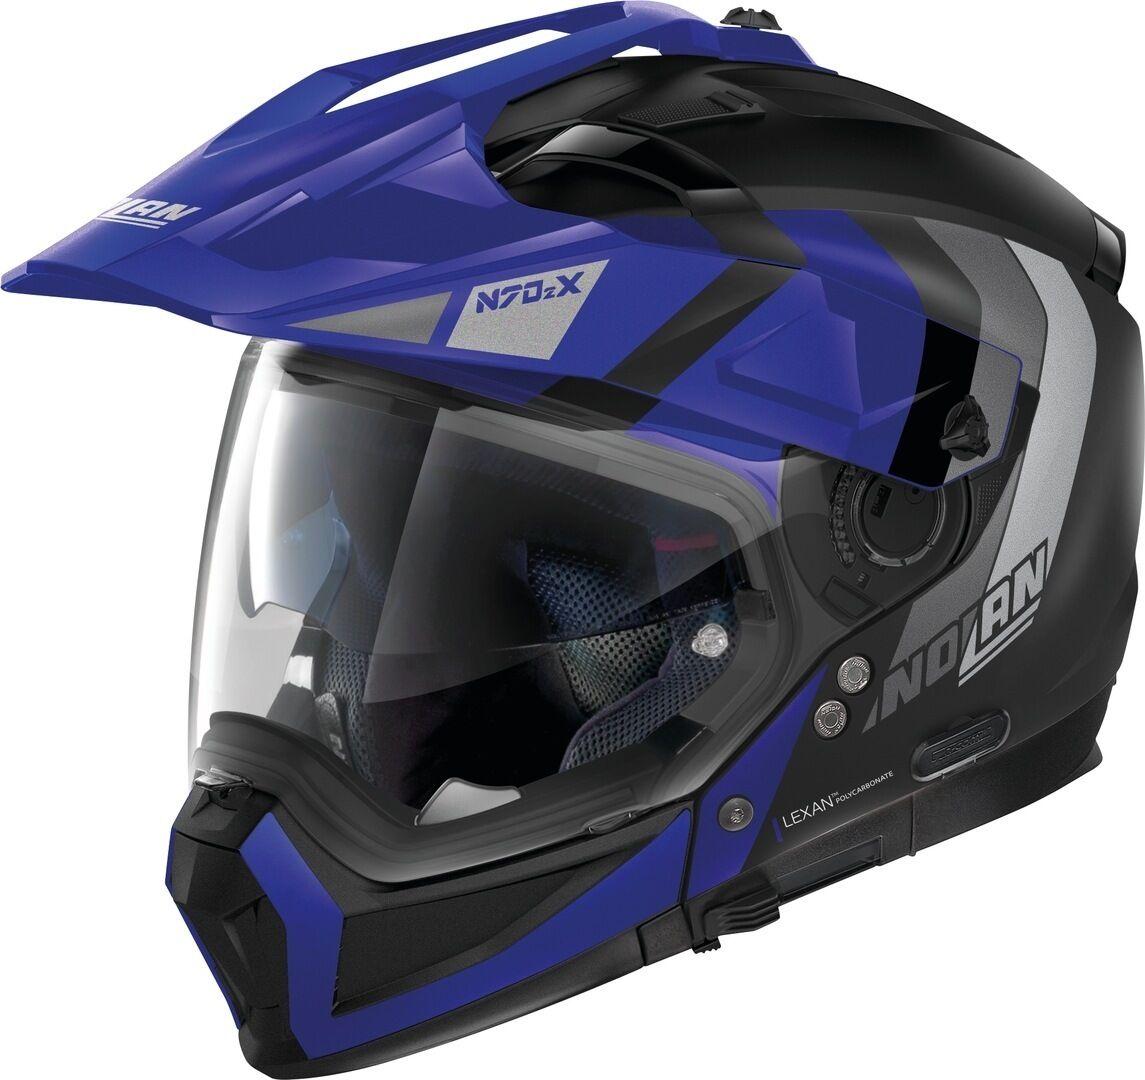 Nolan N70-2 X Decurio N-Com Helmet  - Black Blue - Size: XL